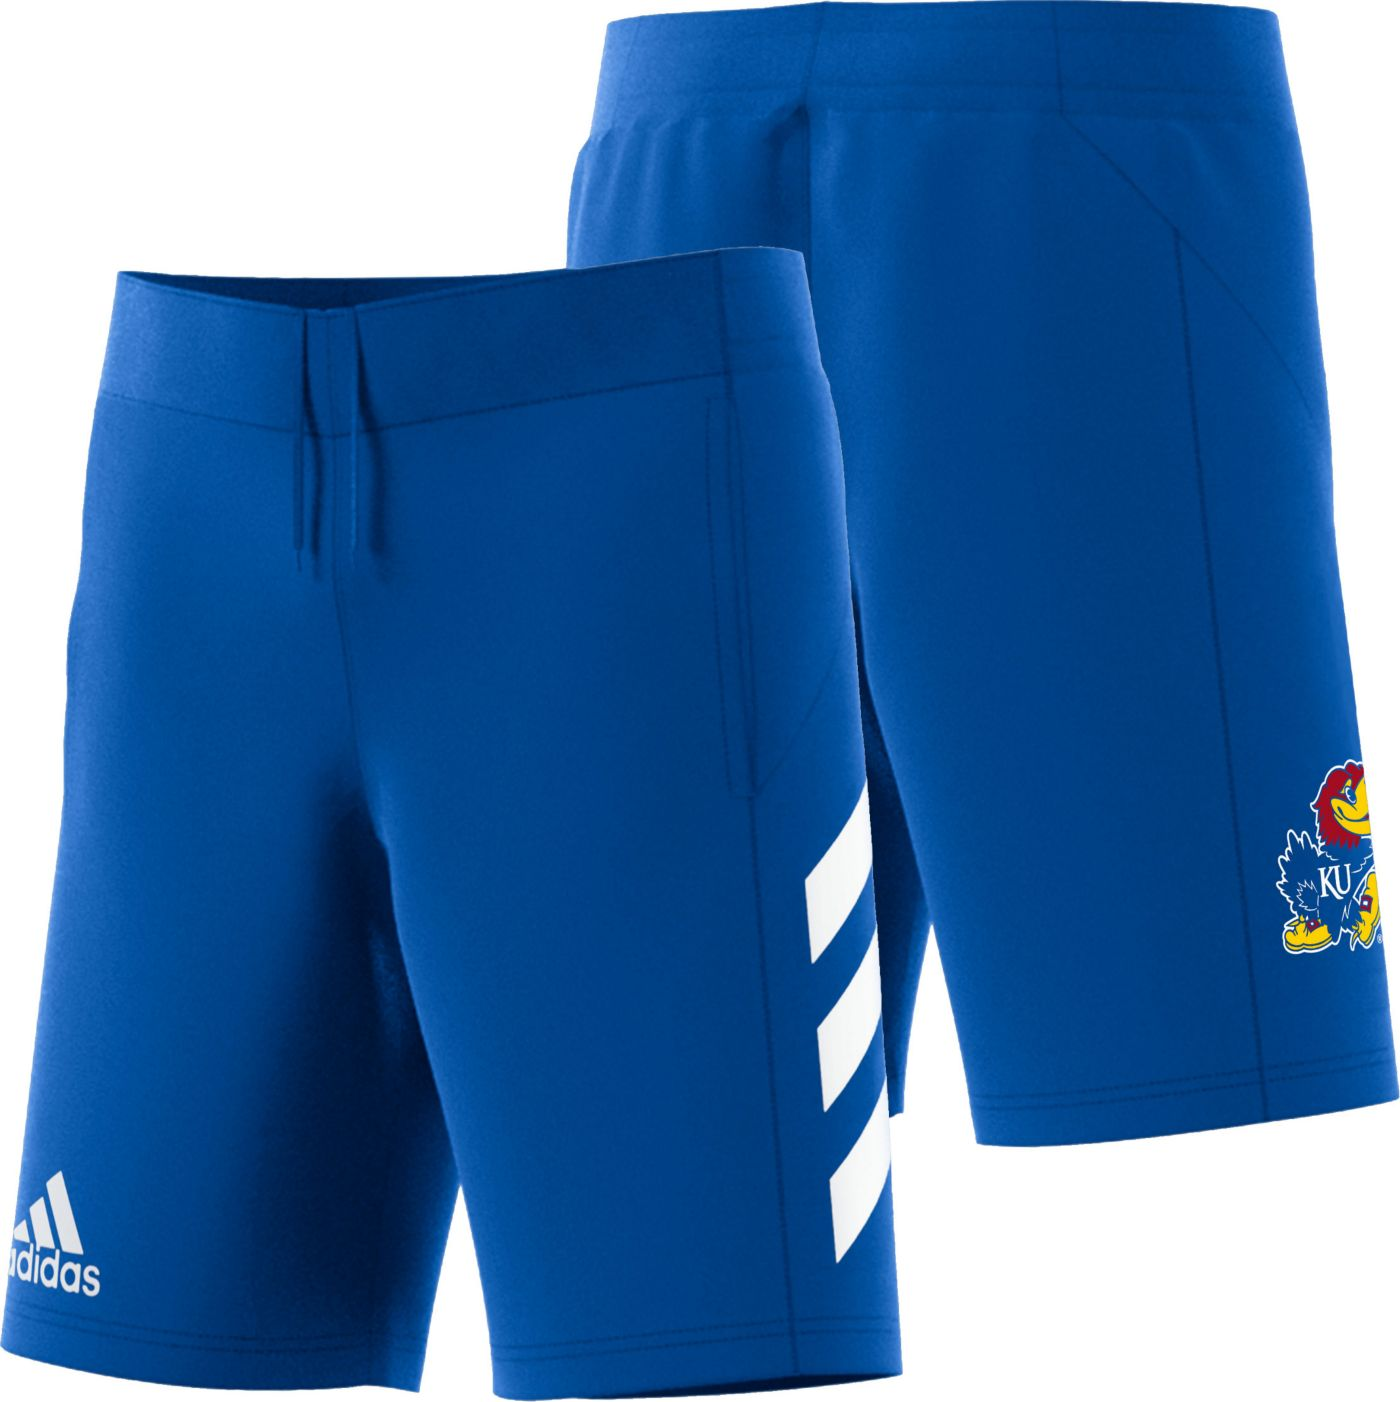 adidas Men's Kansas Jayhawks Blue Practice Basketball Shorts